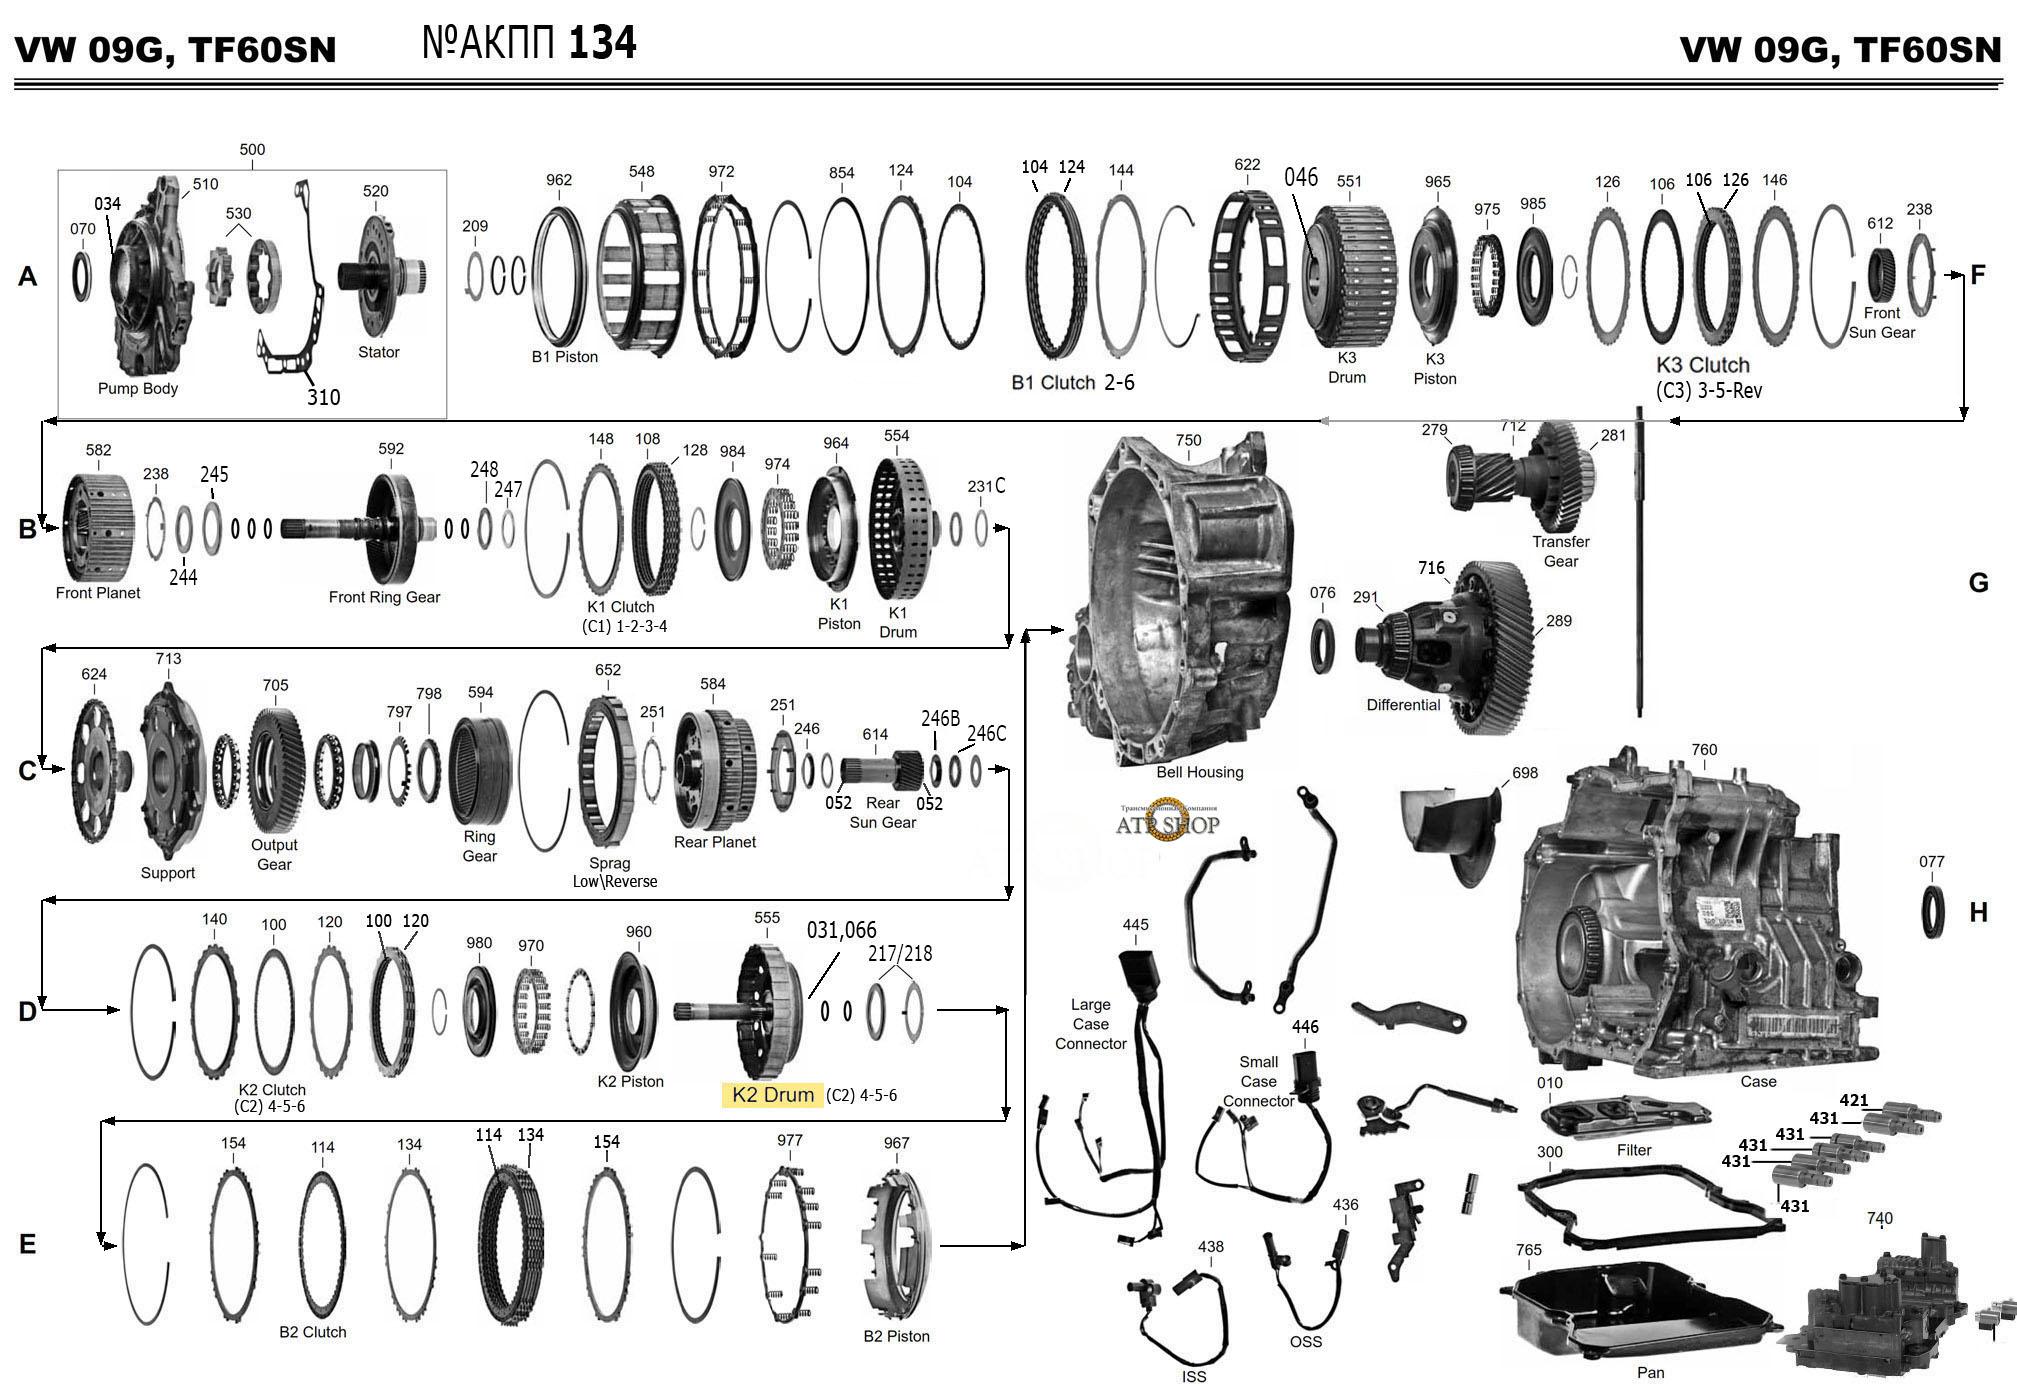 09G, TF60SN-61SN Описание, Запчасти , Цены Типичные